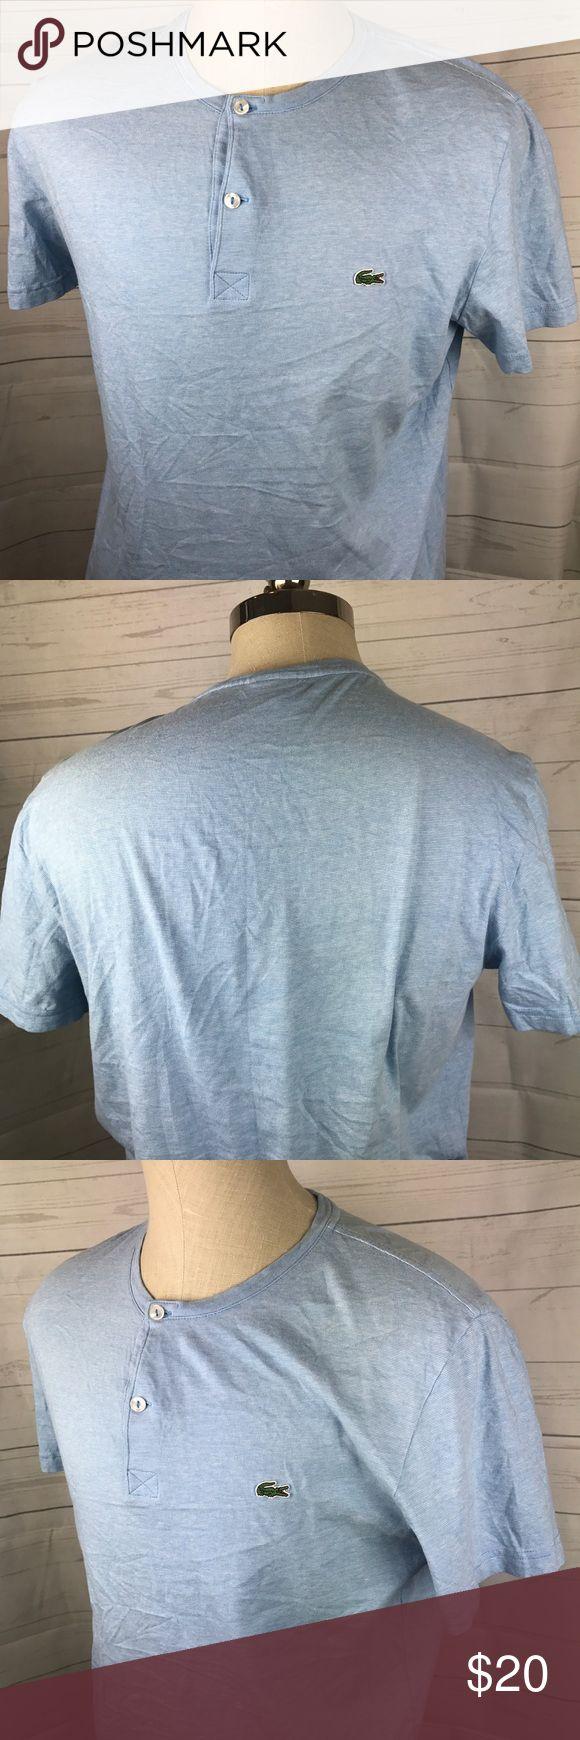 Best 25 lacoste t shirt ideas on pinterest nike retro tennis lacoste t shirt large 2 button henley blue large buycottarizona